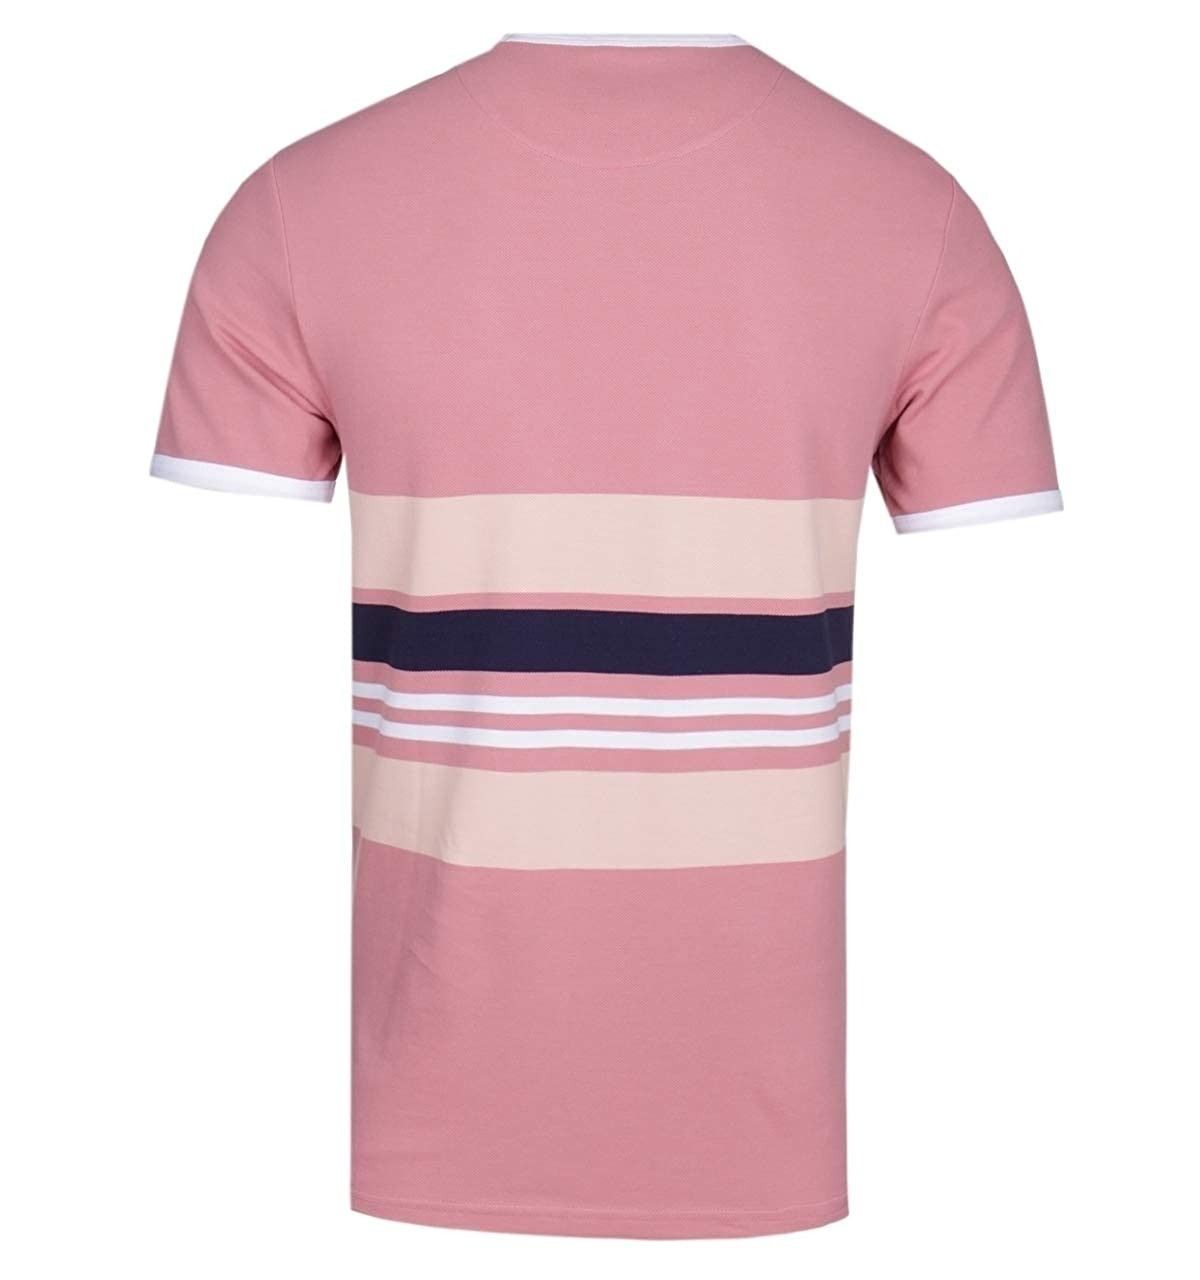 Lyle /& Scott Pique Stripe Pink Blush Ringer T-Shirt